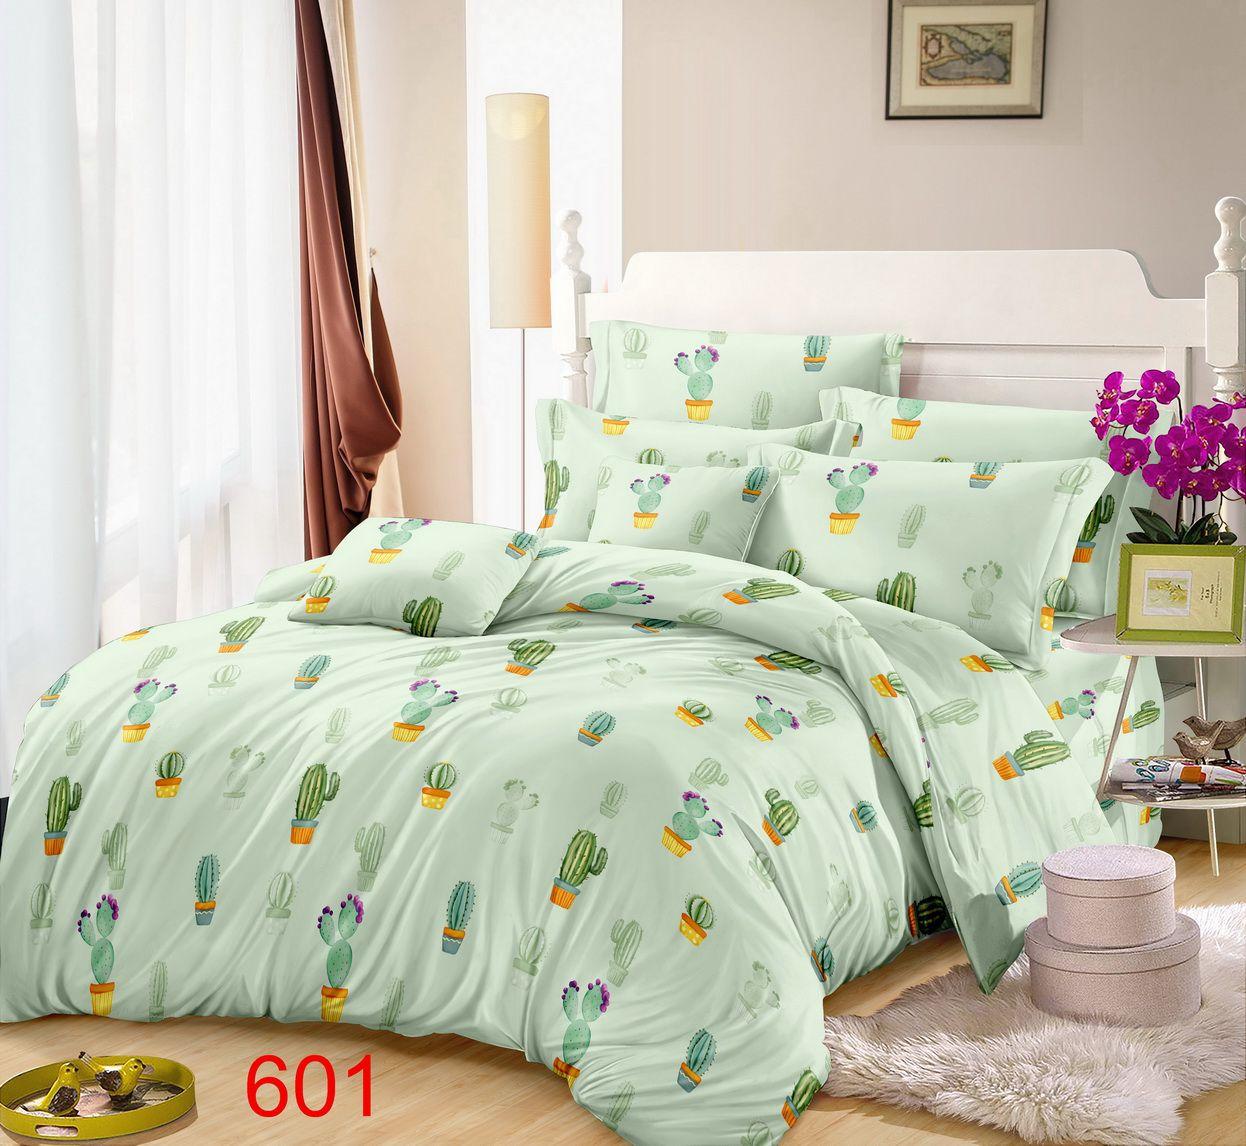 3D Beddings - Antonio - AML-4232 - 160x200 cm - 3 pcs